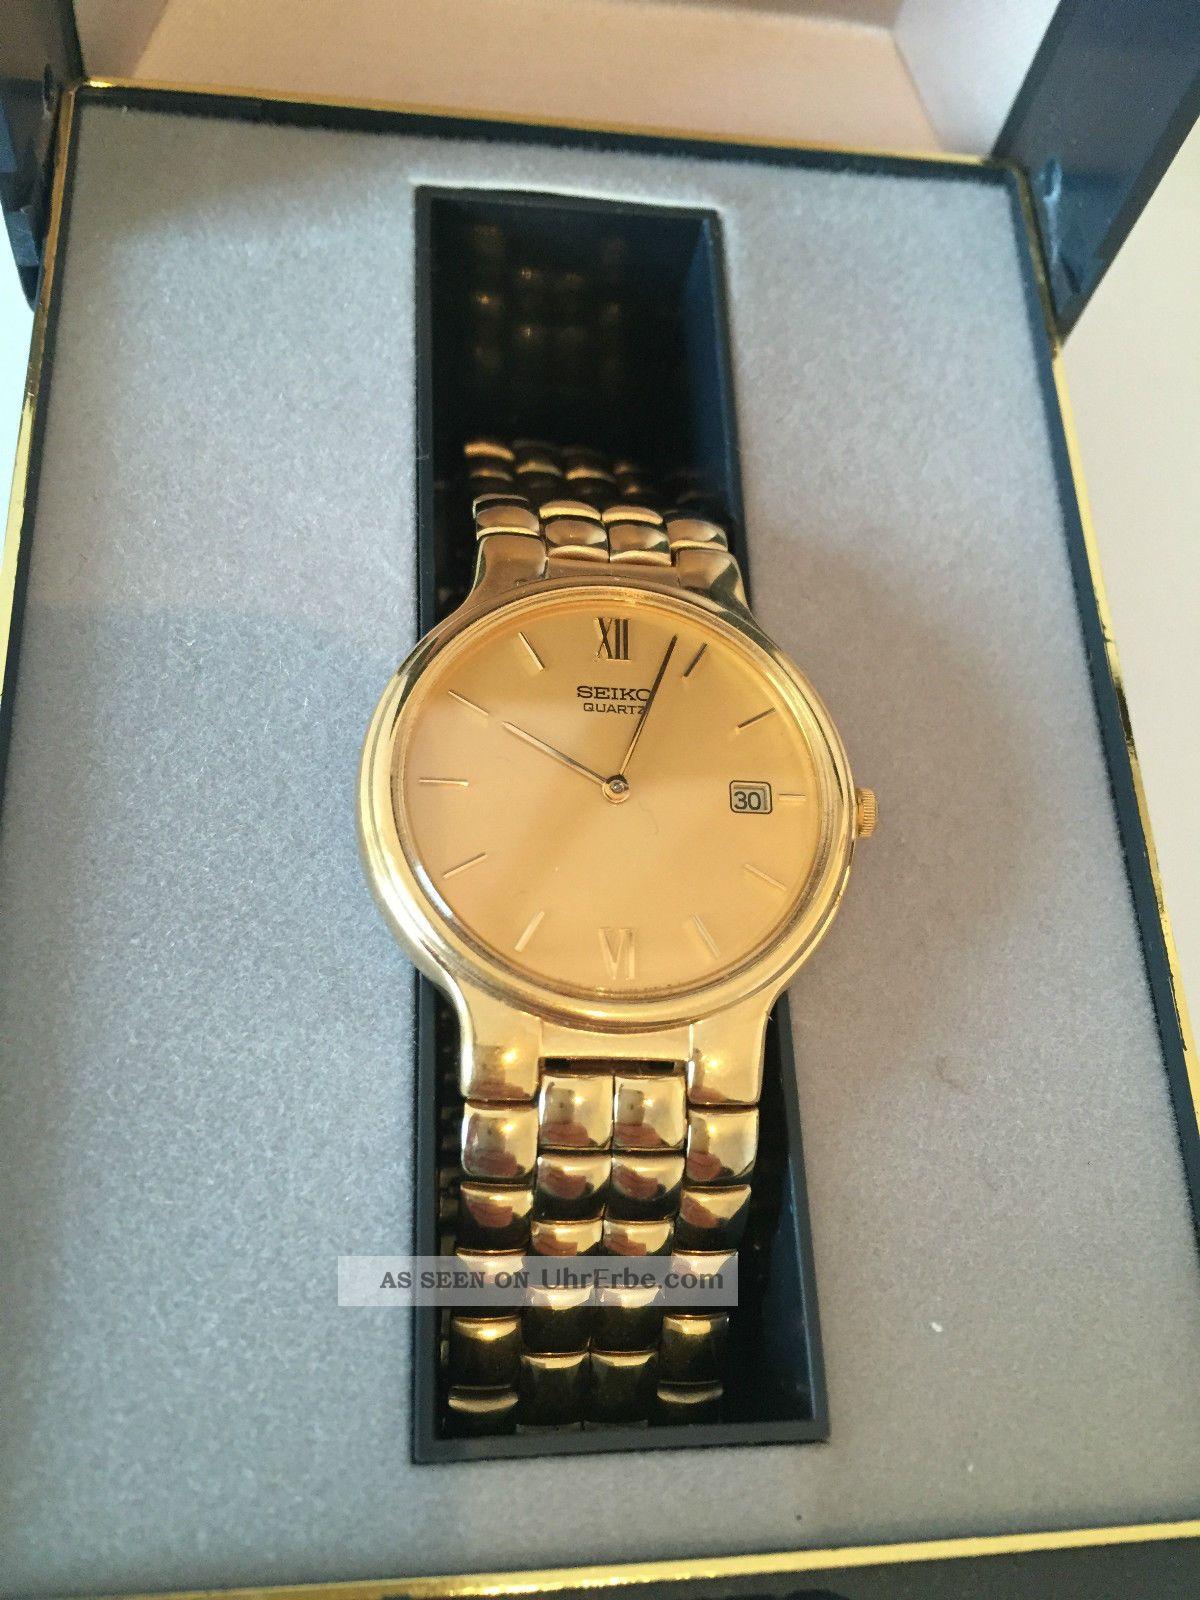 Uhr Armbanduhr Seiko Quartz 7n28 - 6201 Metal Mit Ovp Neue Batterie Armbanduhren Bild